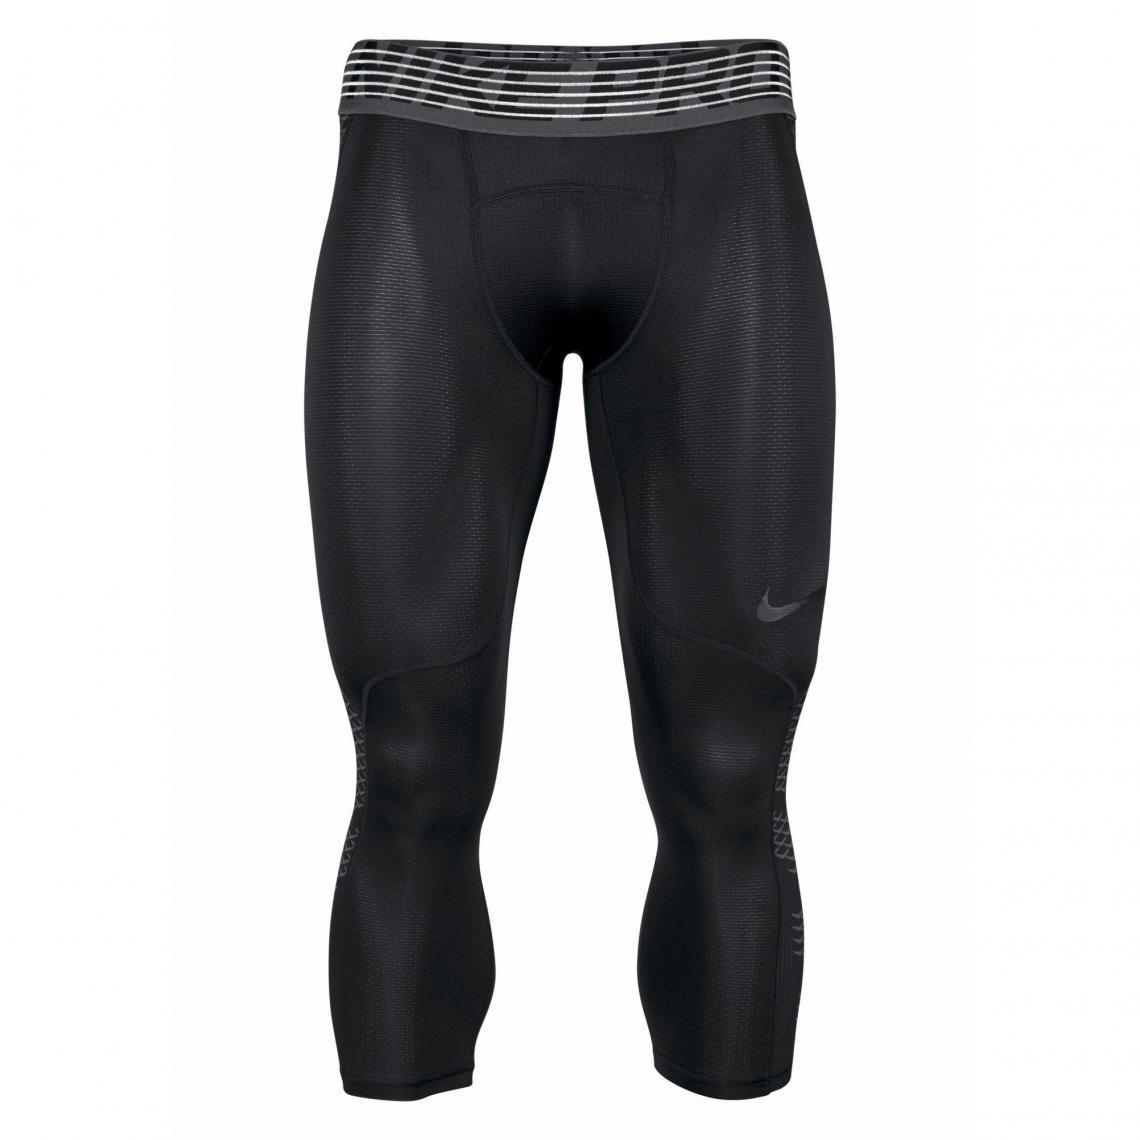 Collant de sport 34 homme Pro Hypercool Tight 3QT Nike - Noir Nike 00c48897676